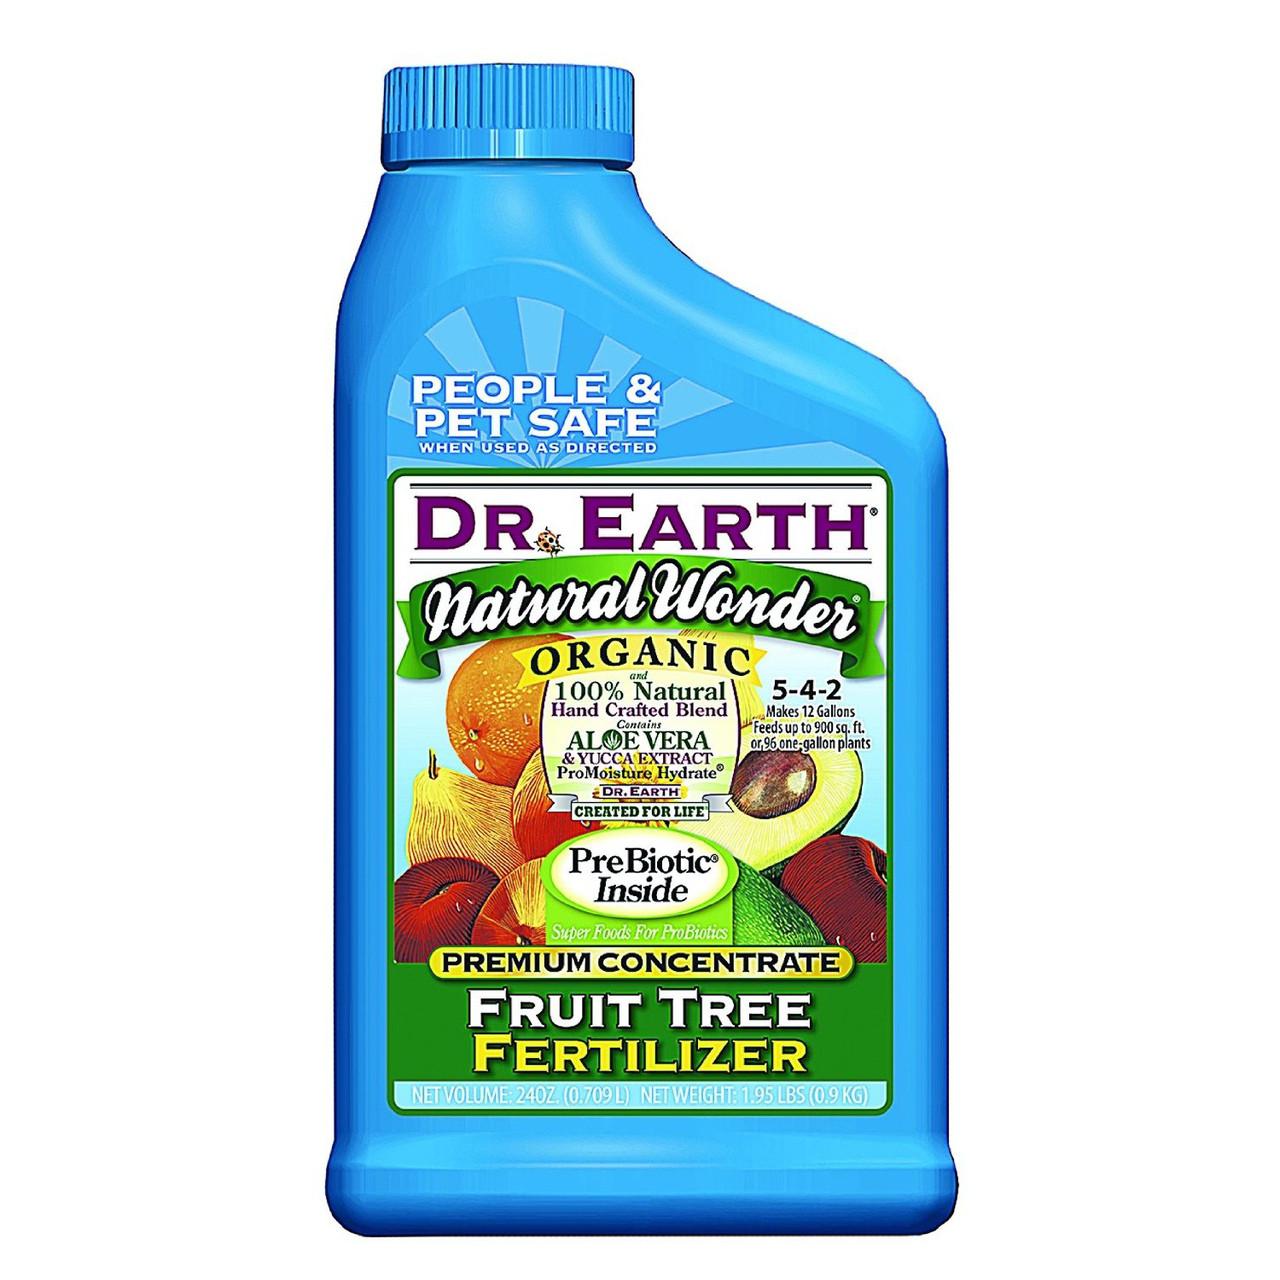 Dr. Earth Natural Wonder Organic Fruit Tree Fertilizer